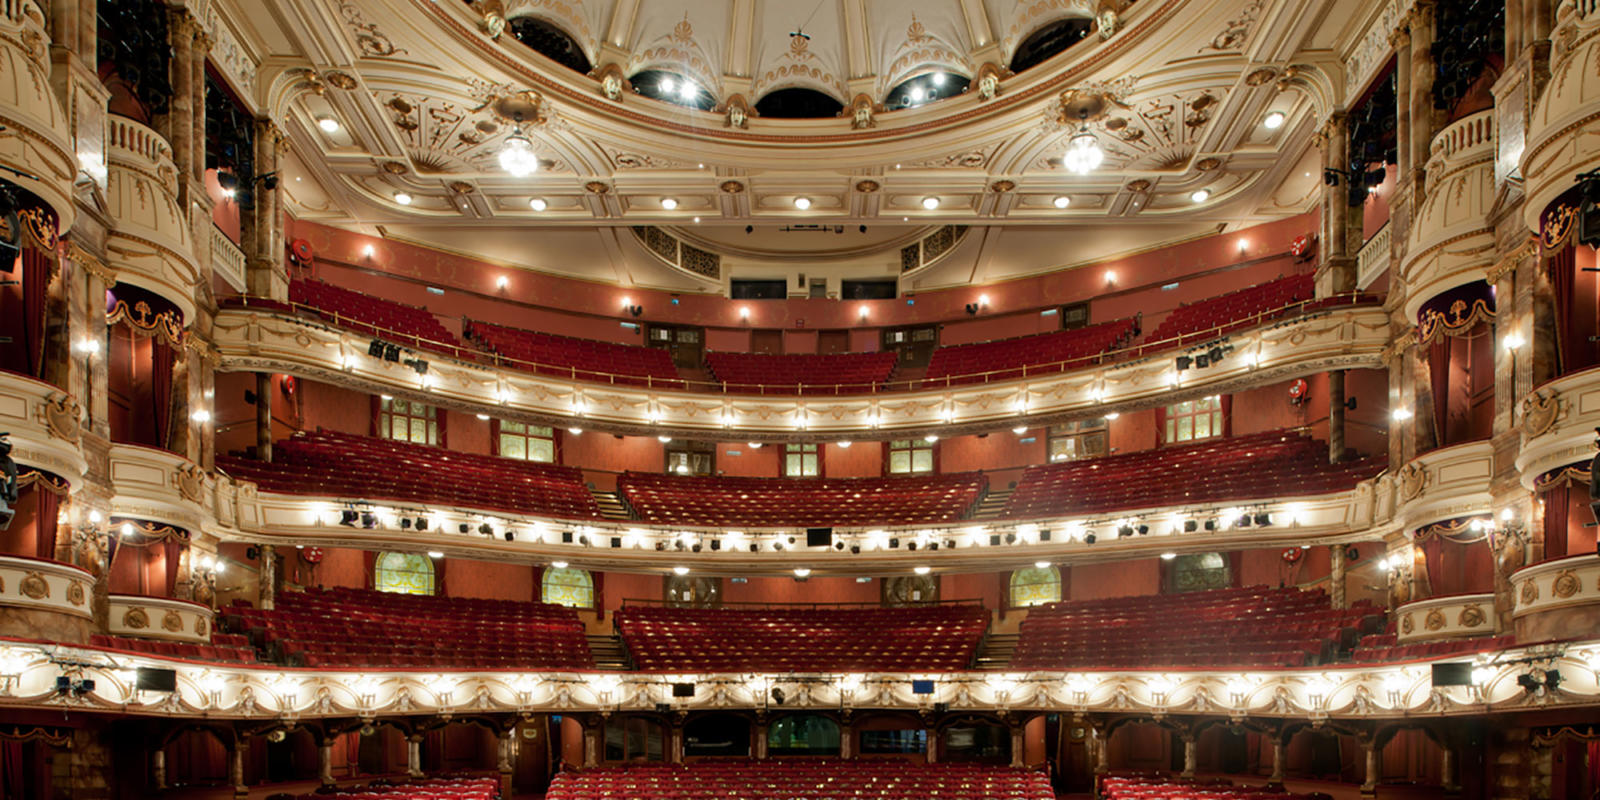 Coliseum auditorium (c) Guillaume de Laubier